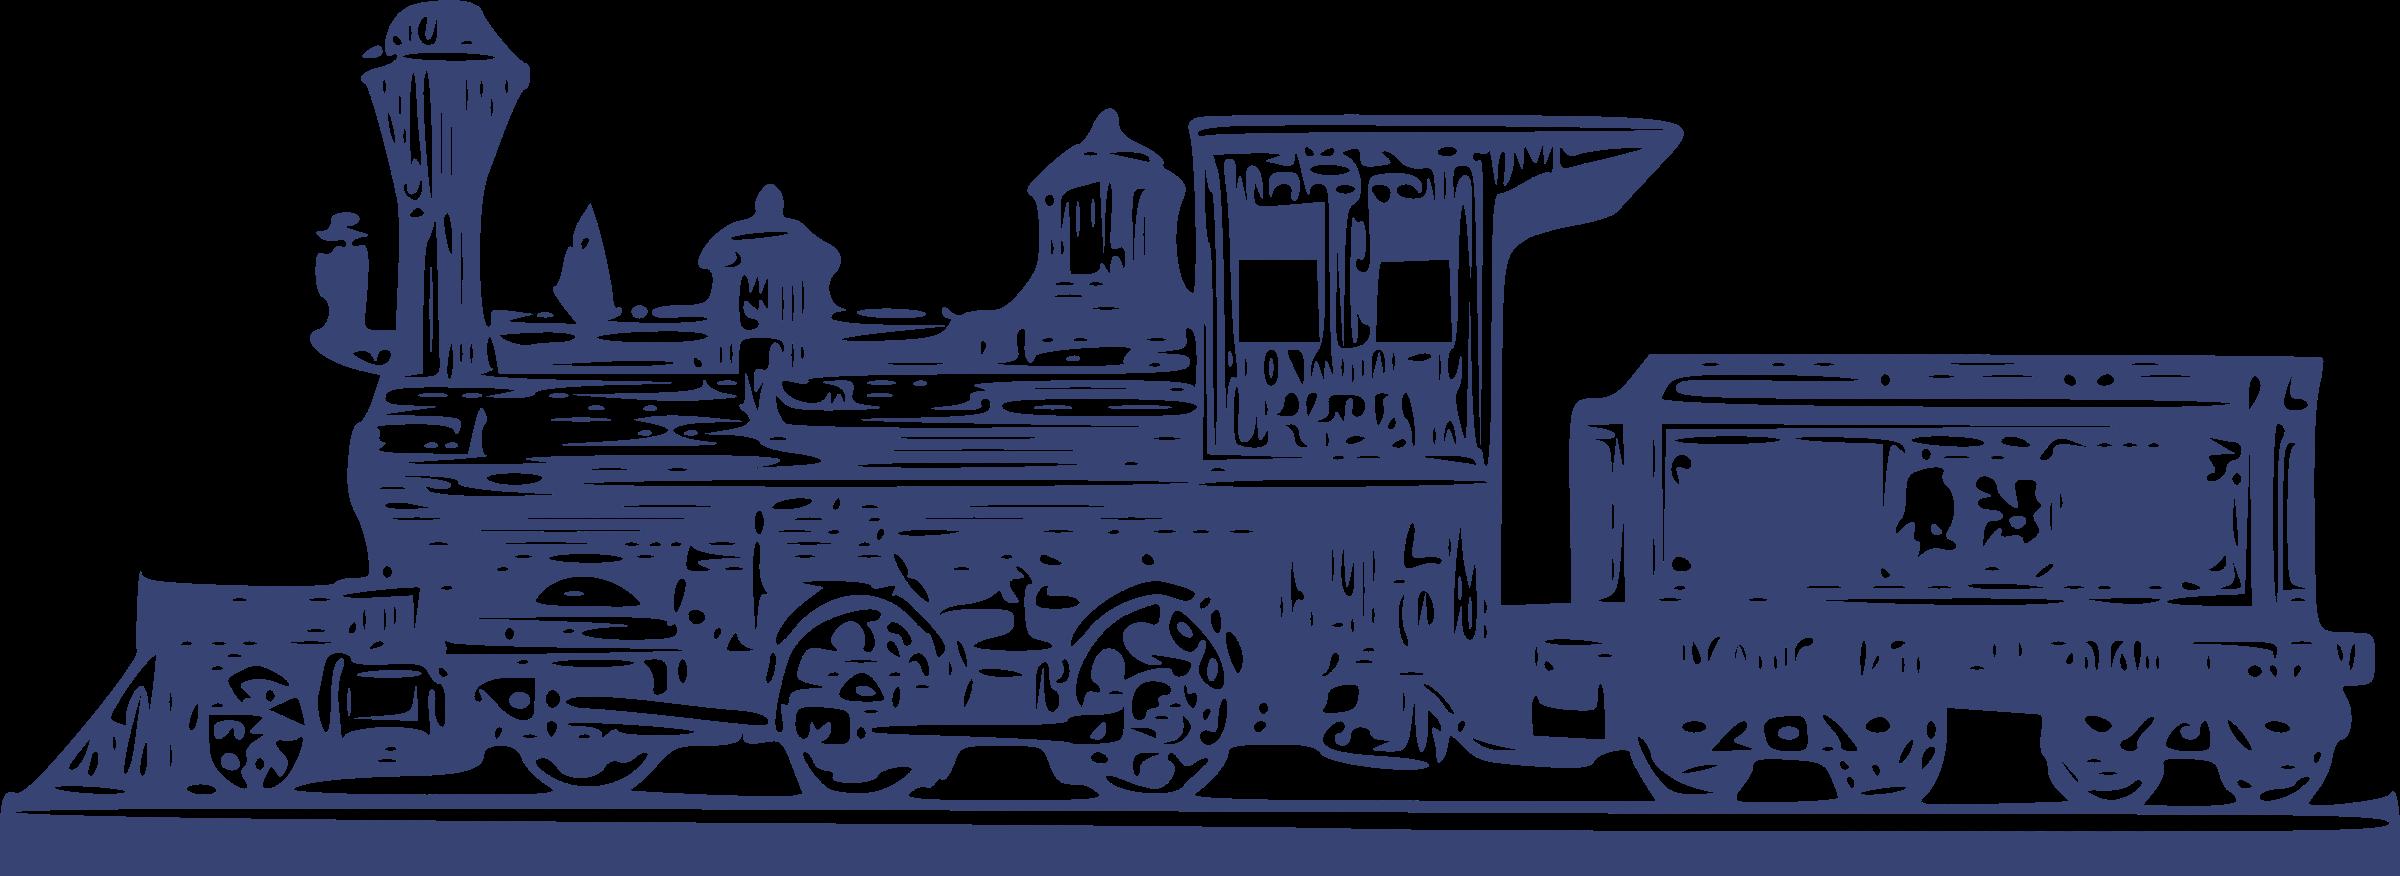 Engine clipart steam engine. Big image png